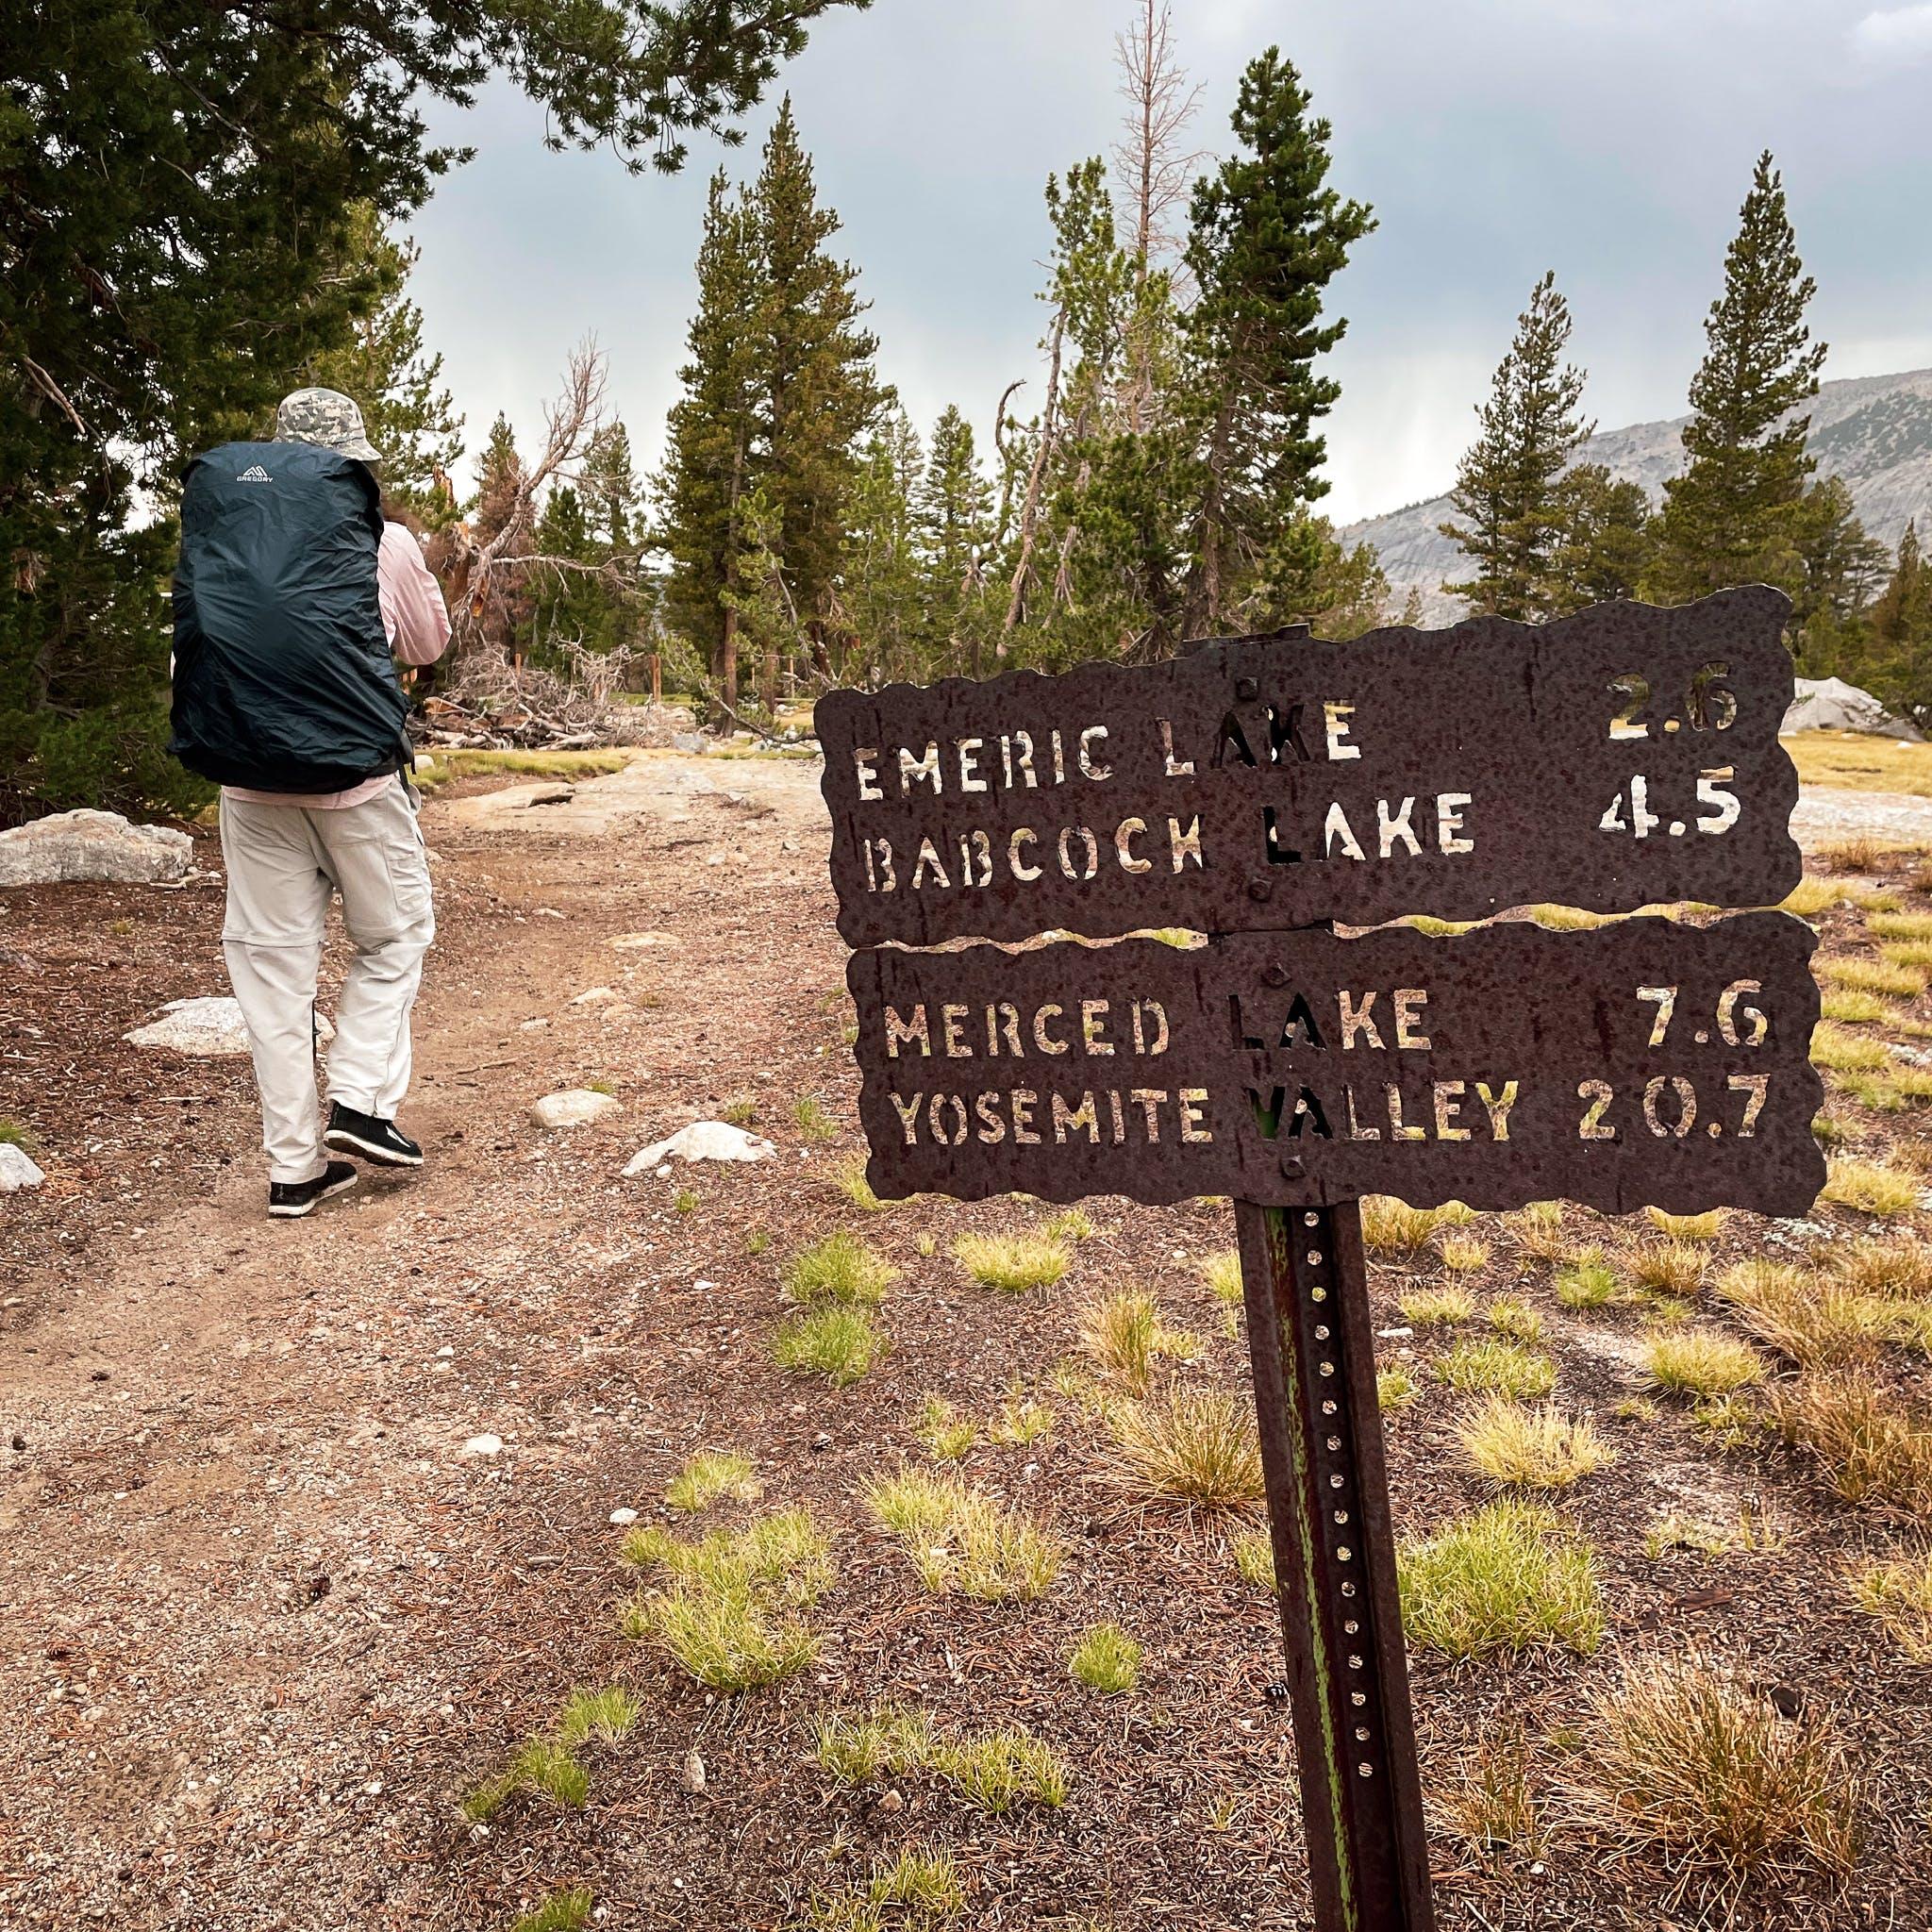 trail sign in Yosemite High Sierra